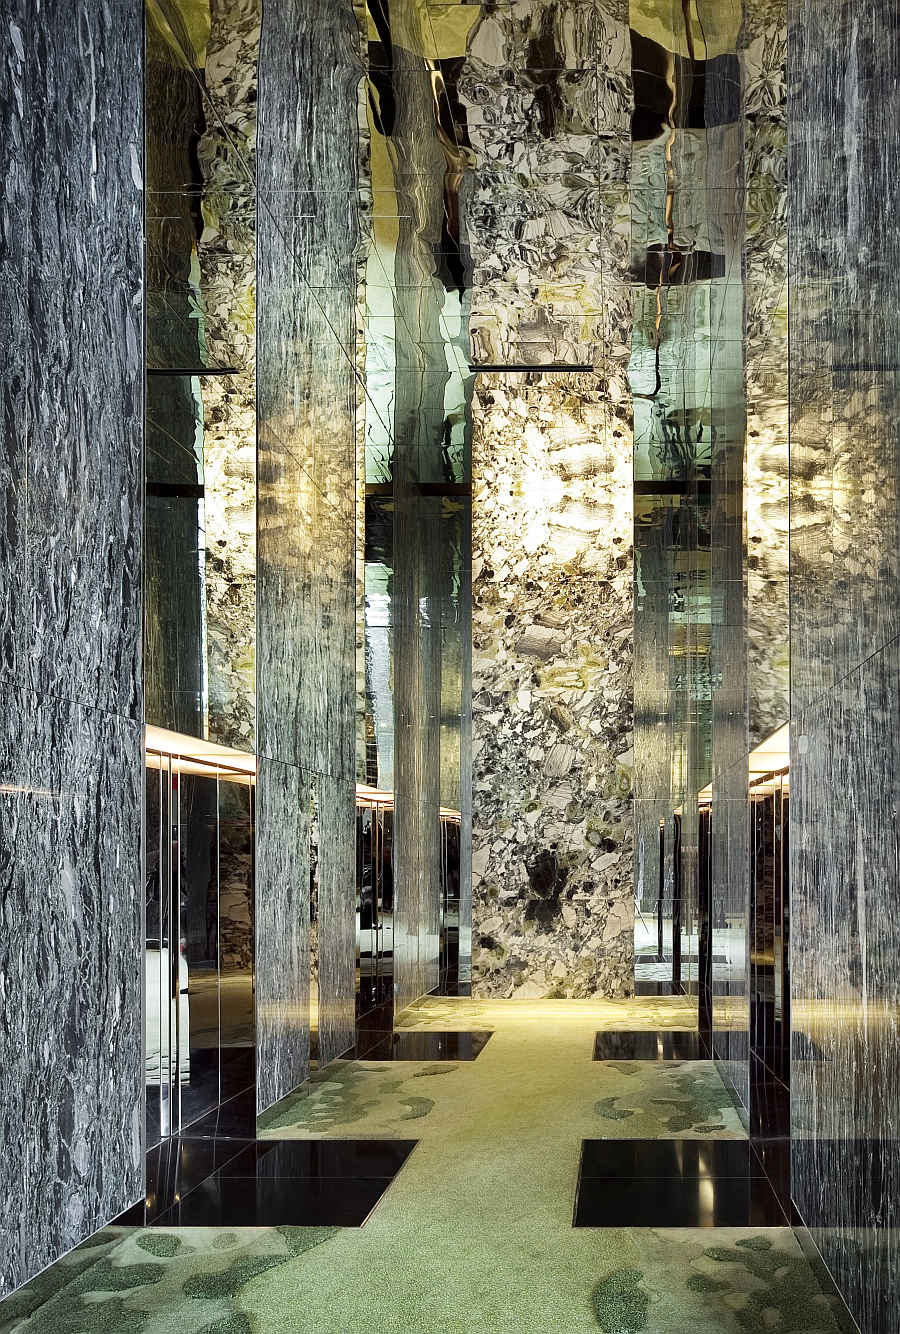 Breathtaking Green Hotel In Singapore Showcases